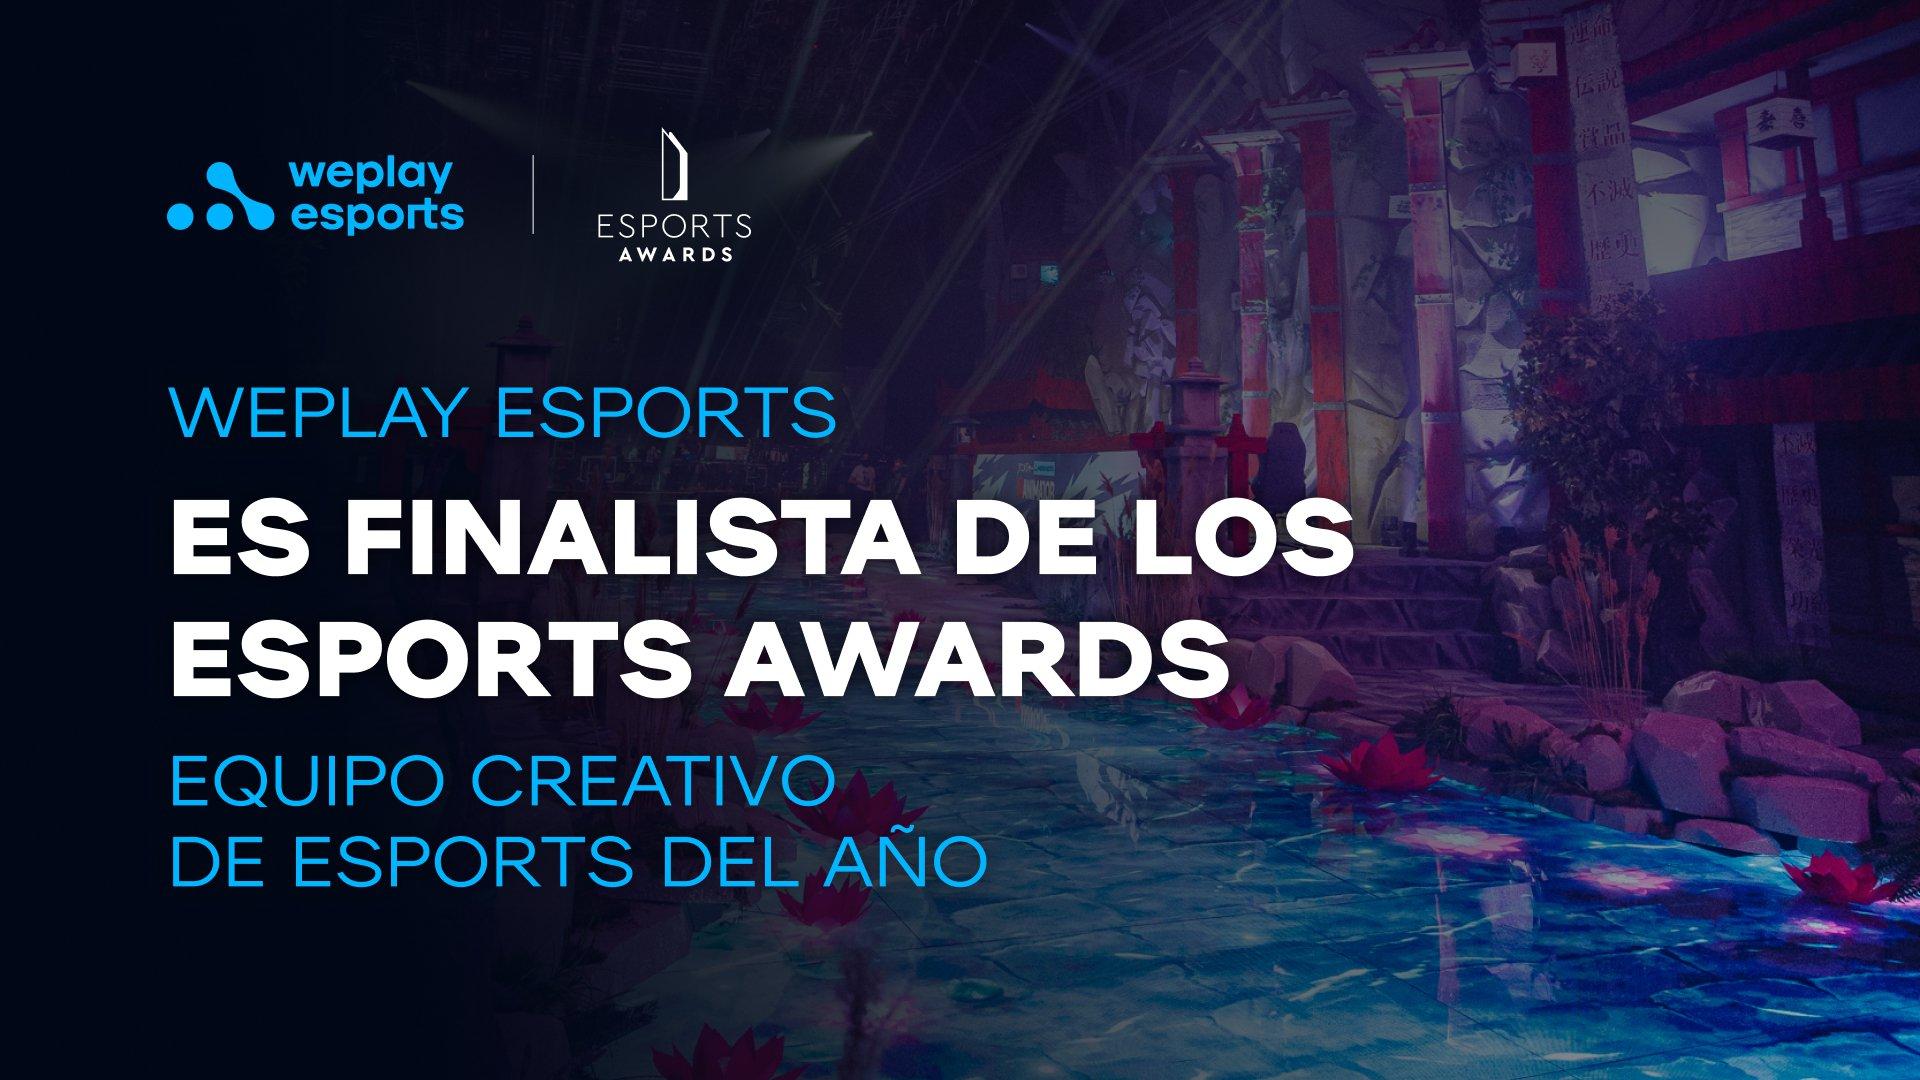 WePlay Esports es finalista de los Esports Awards. Foto: WePlay Holding